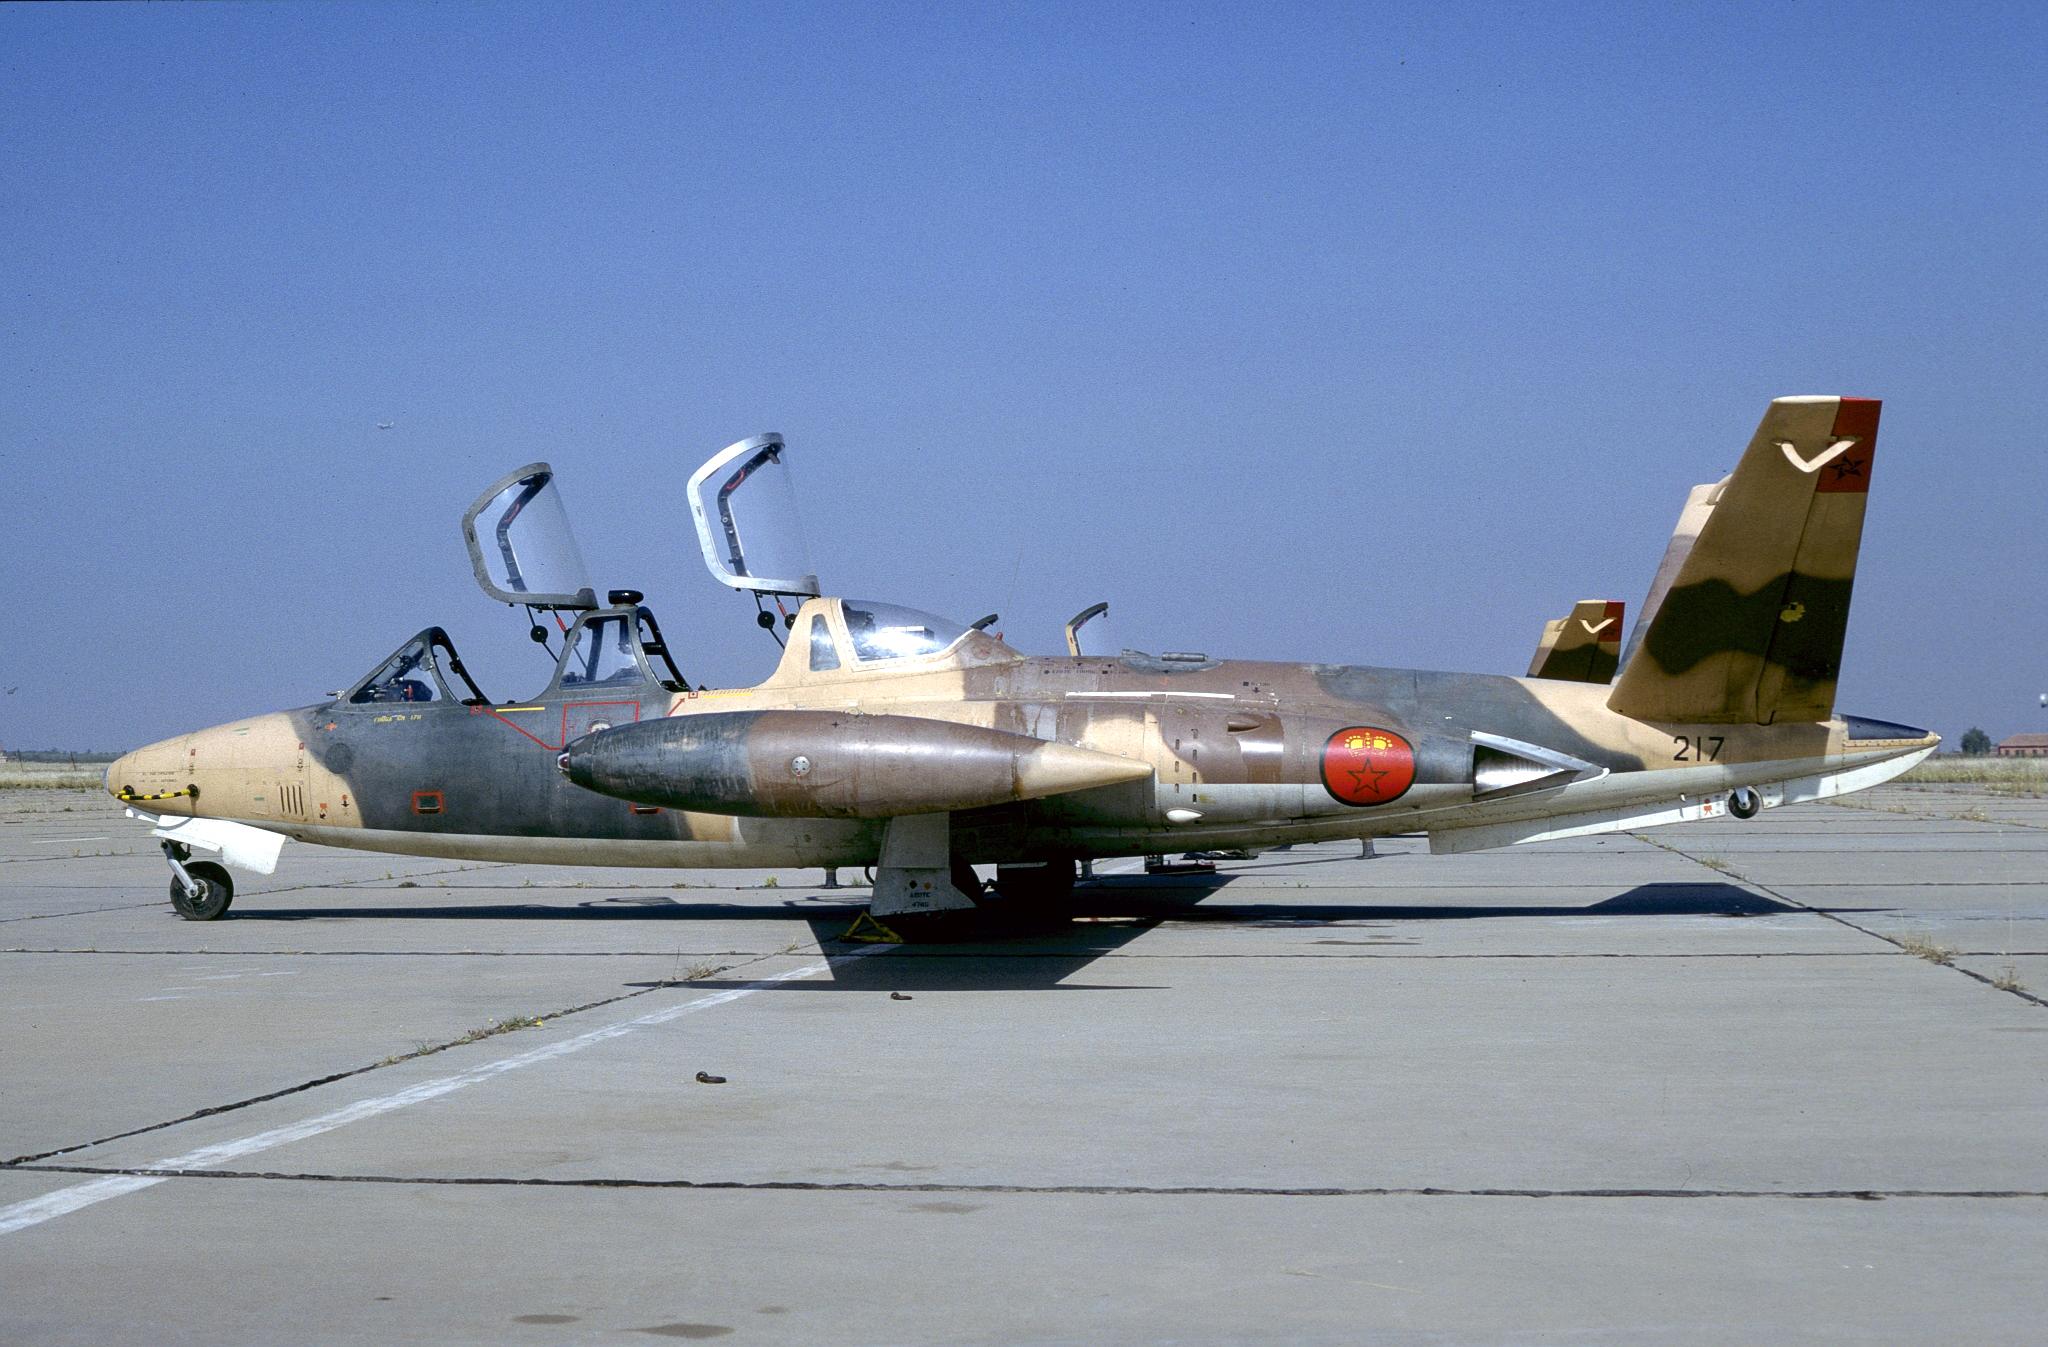 FRA: Photos anciens avions des FRA - Page 13 31336225675_2627510cf7_o_d